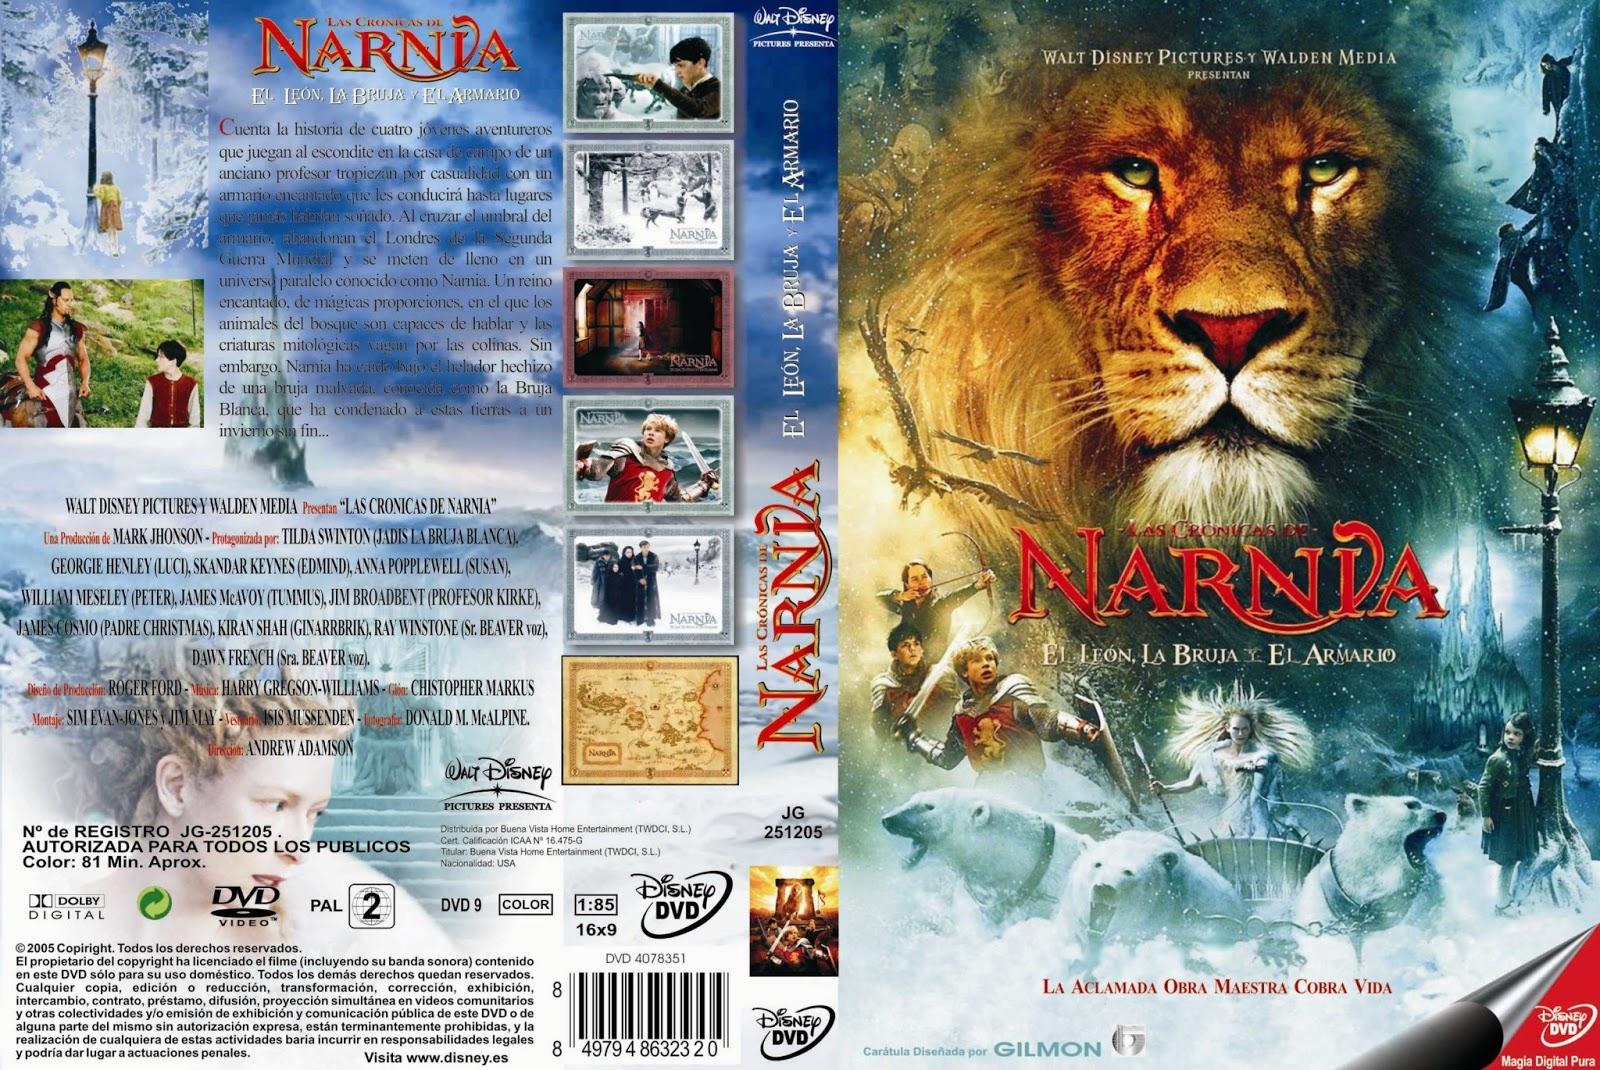 narnia 3 movie in hindi